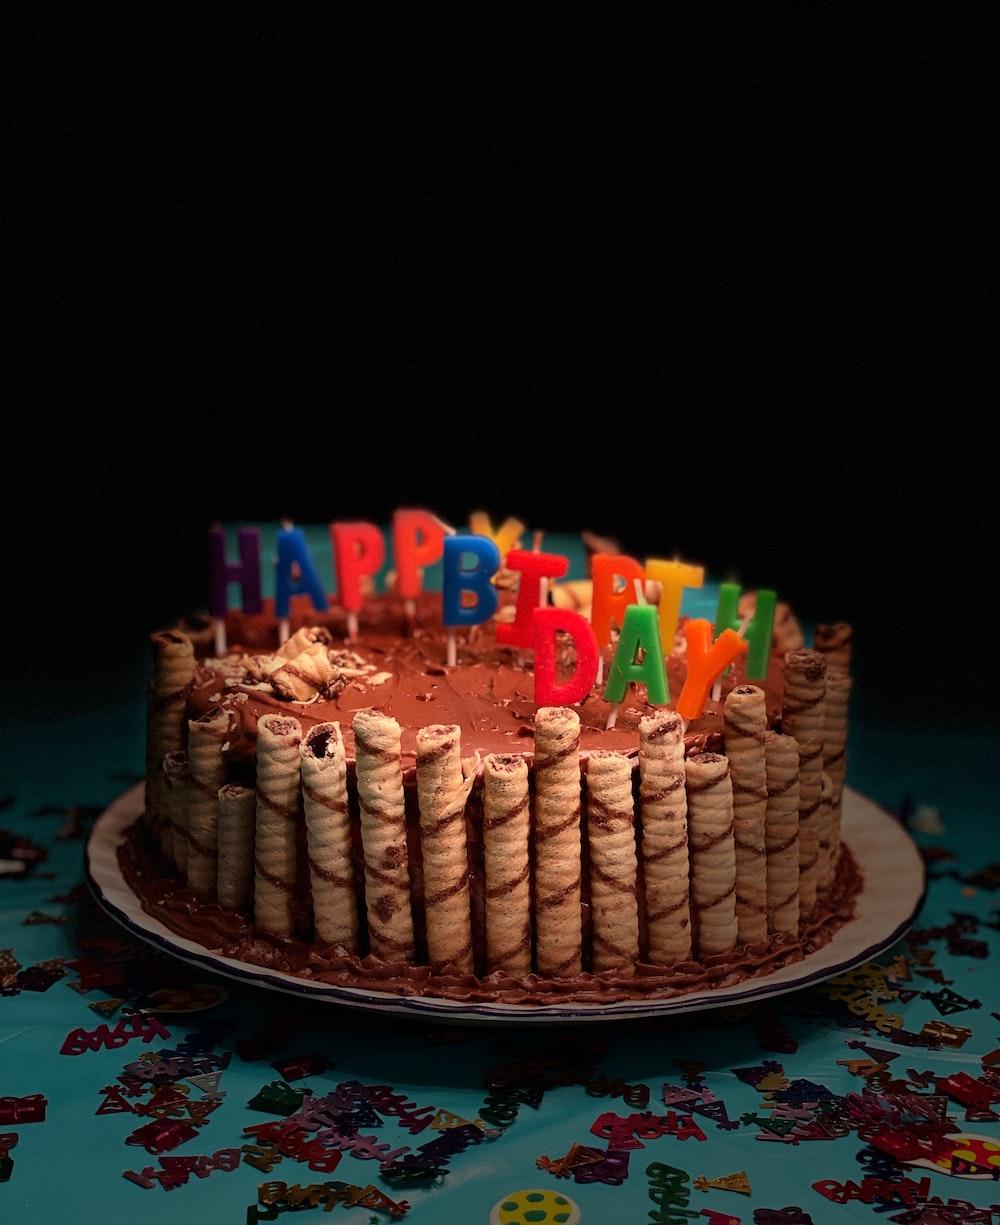 Happy Birthday Cake With Happy Birthday Candles Photo Free Birthday Cake Image On Unsplash